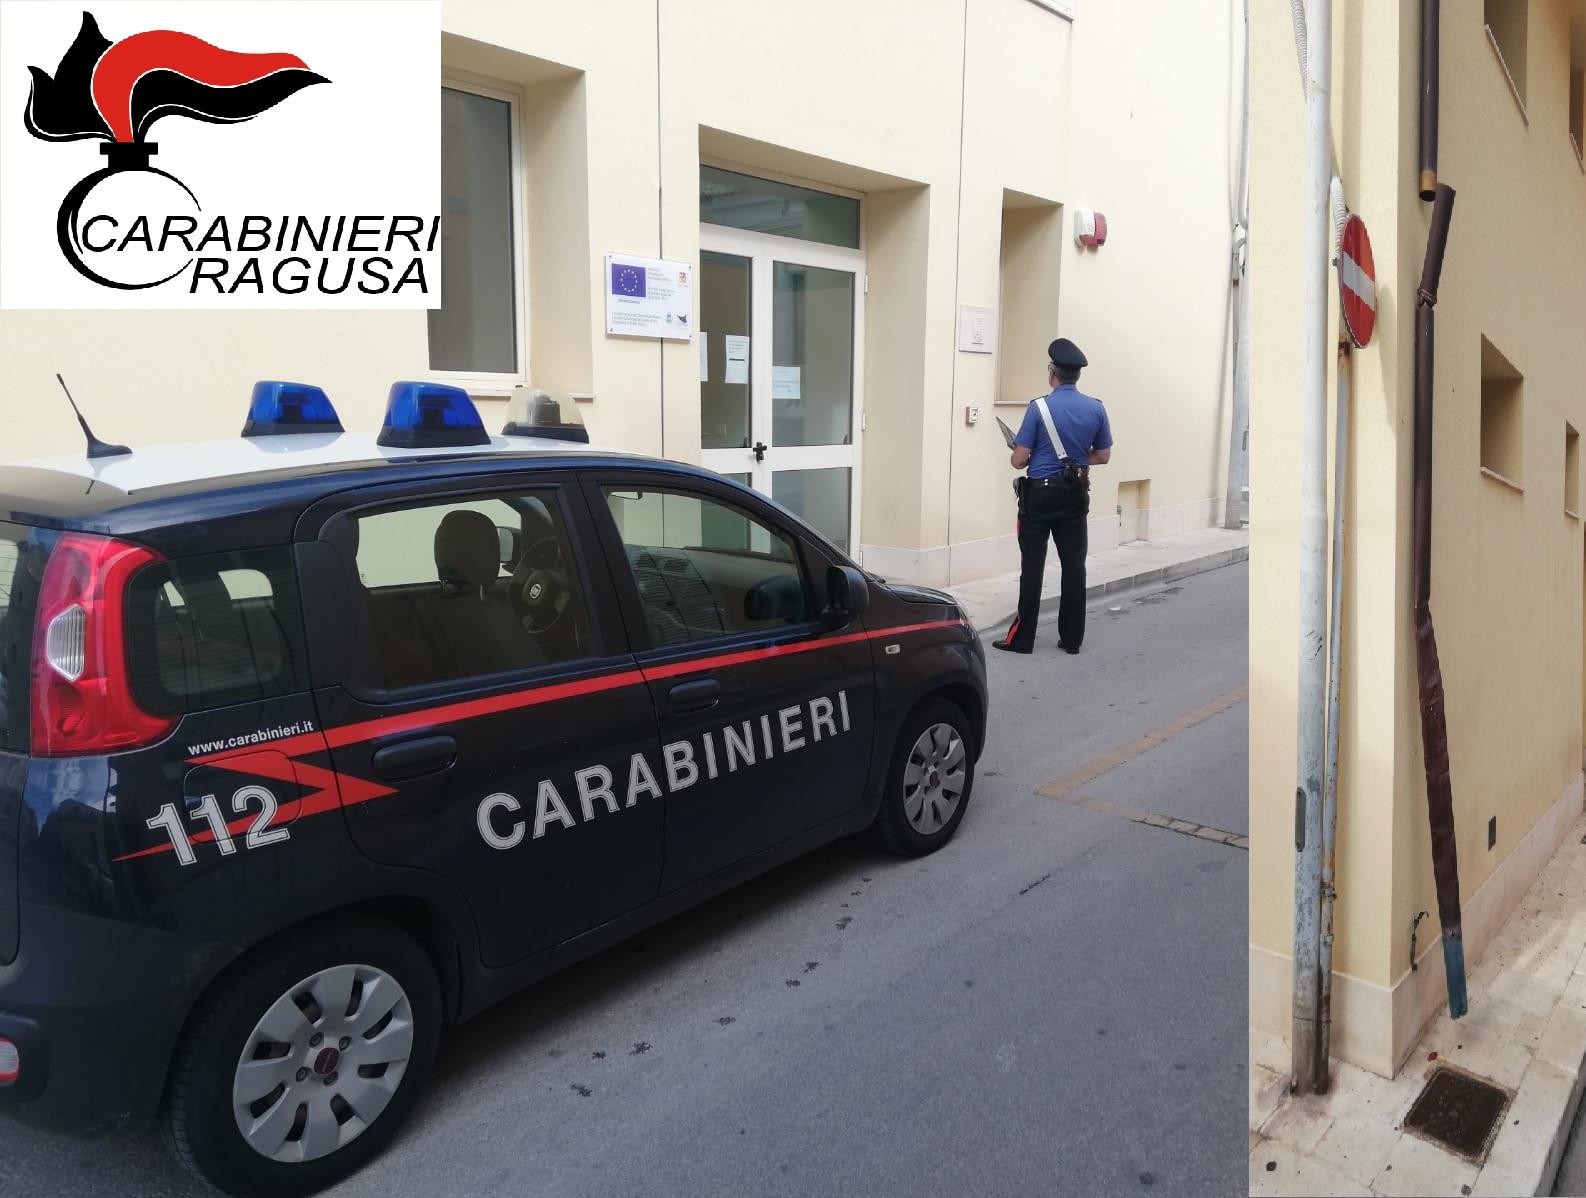 Santa Croce Camerina,  2 giovani sorpresi a rubare le grondaie di rame